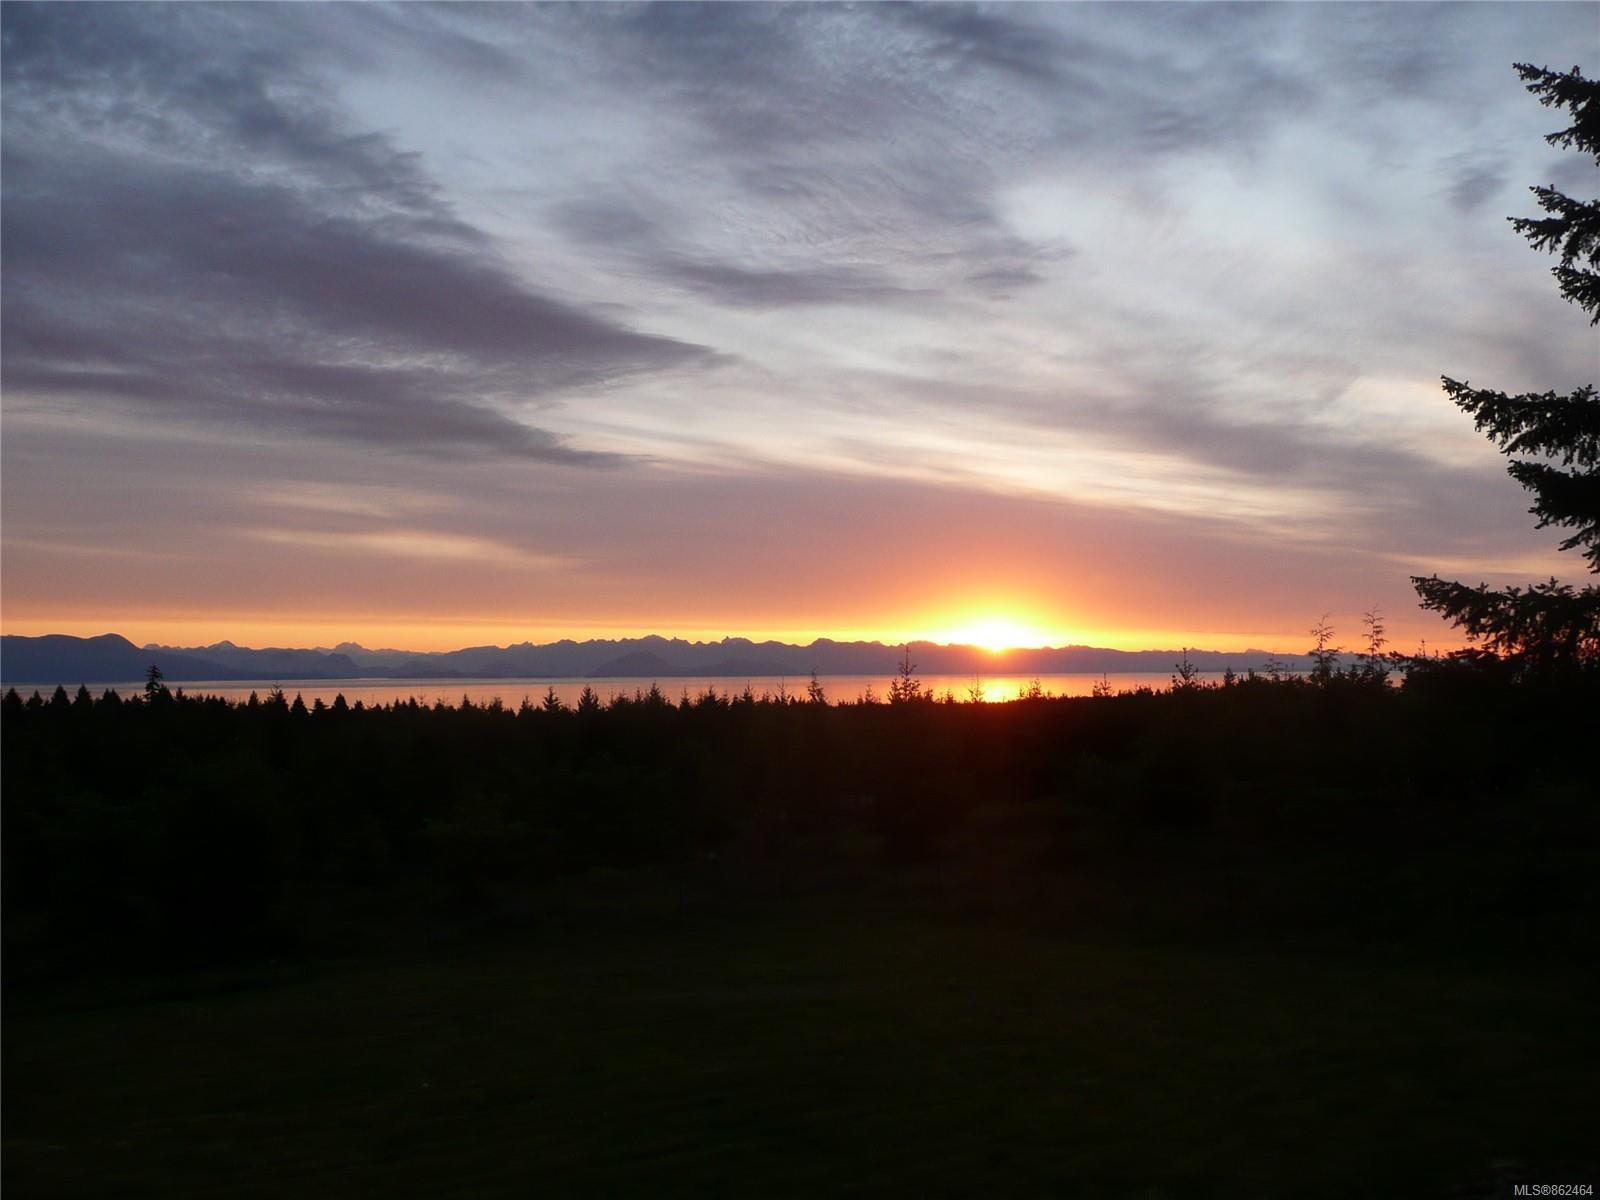 Main Photo: 1886 Seymour Rd in : Isl Gabriola Island Land for sale (Islands)  : MLS®# 862464